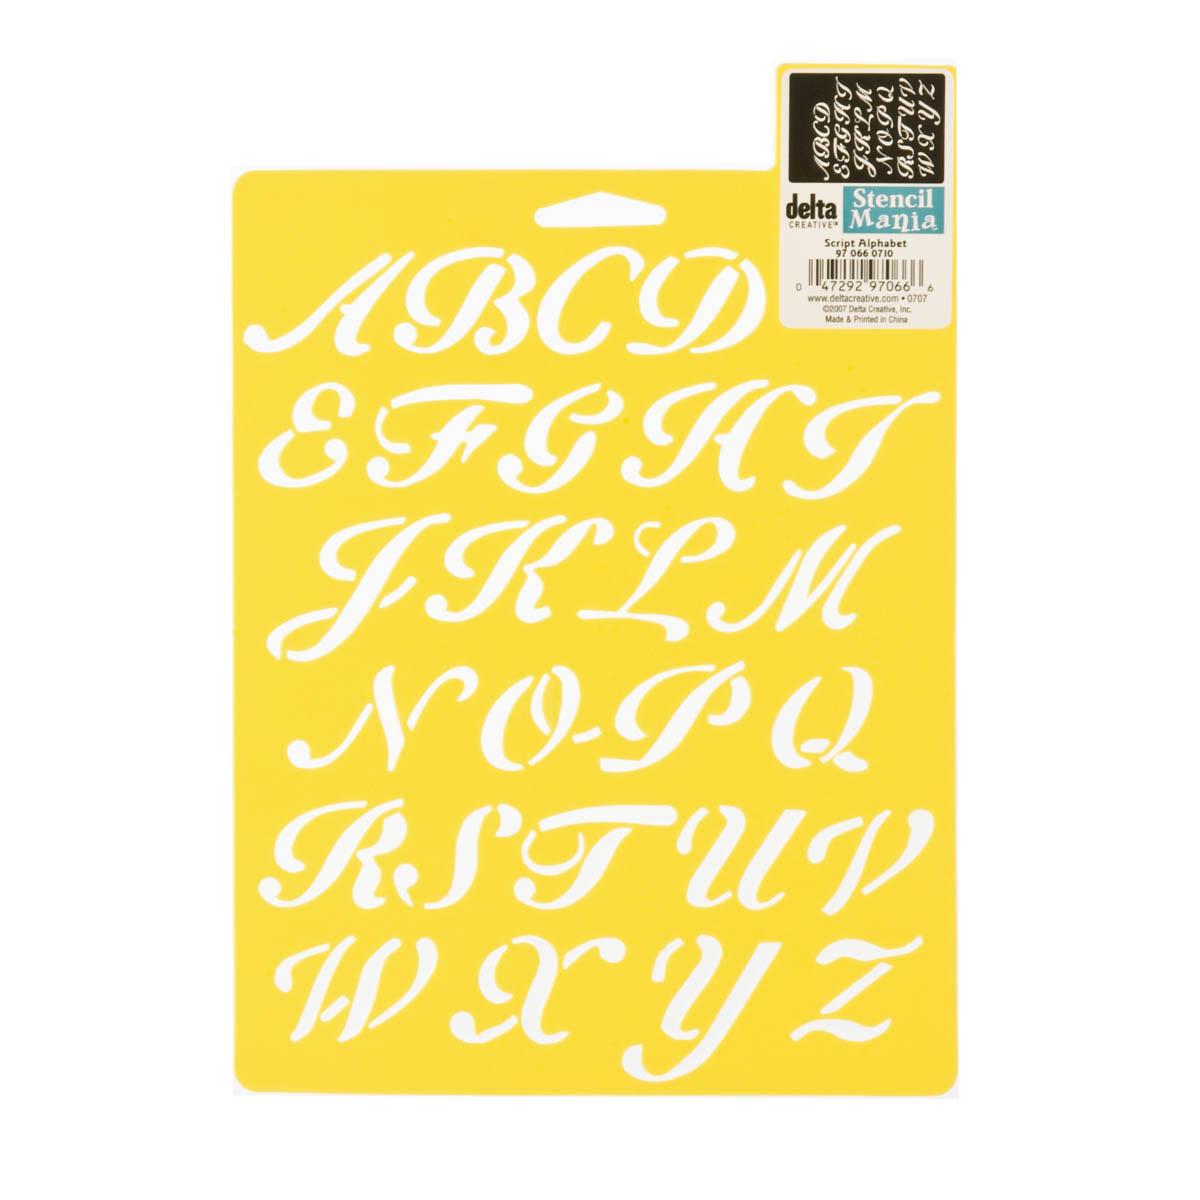 Delta Stencil Mania™ - Alphabet - Script